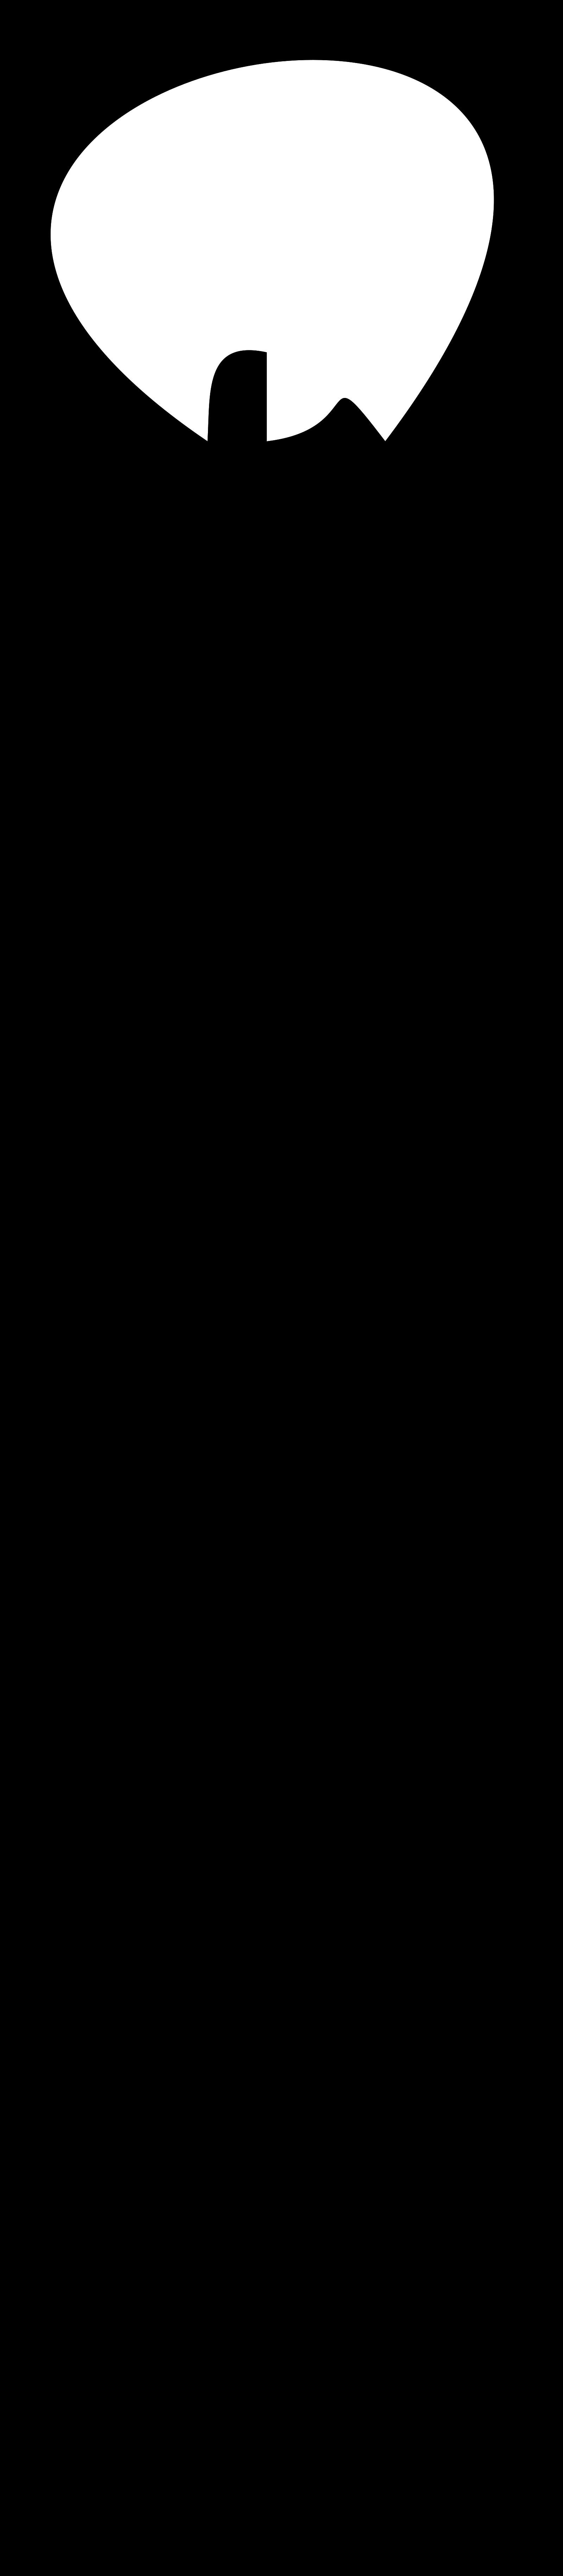 Sport SVG Clip arts